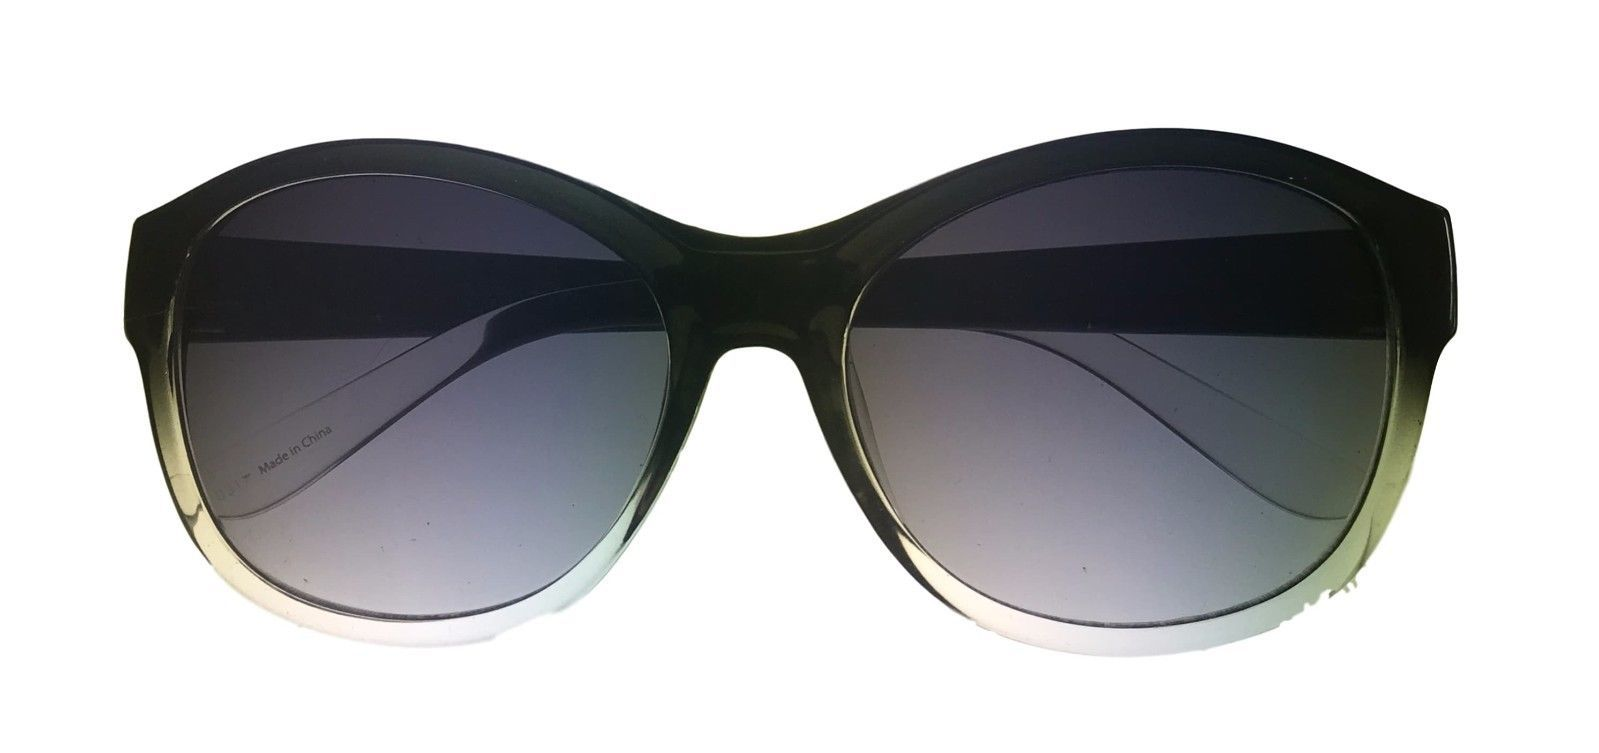 Kenneth Cole Reaction Mens Plastic Sunglass Black Fade, Gradient KC1290 5B image 4